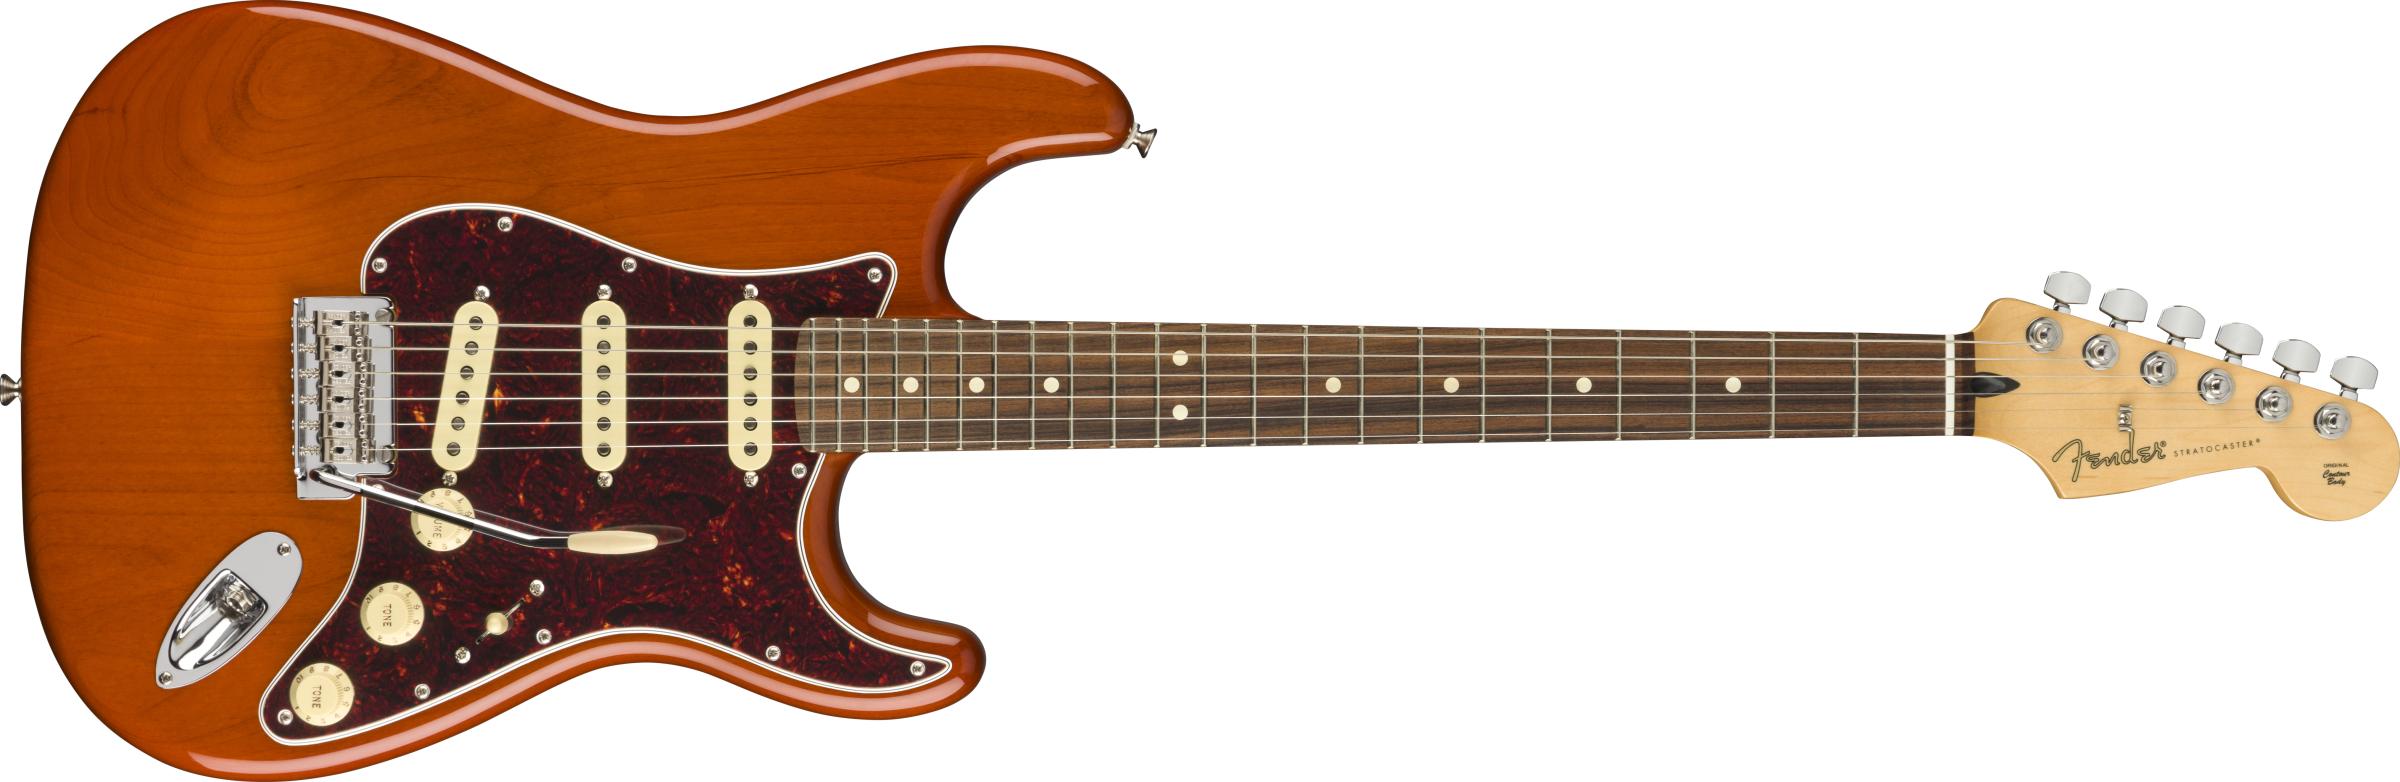 Fender Player Strat SSS PF Aged Natural